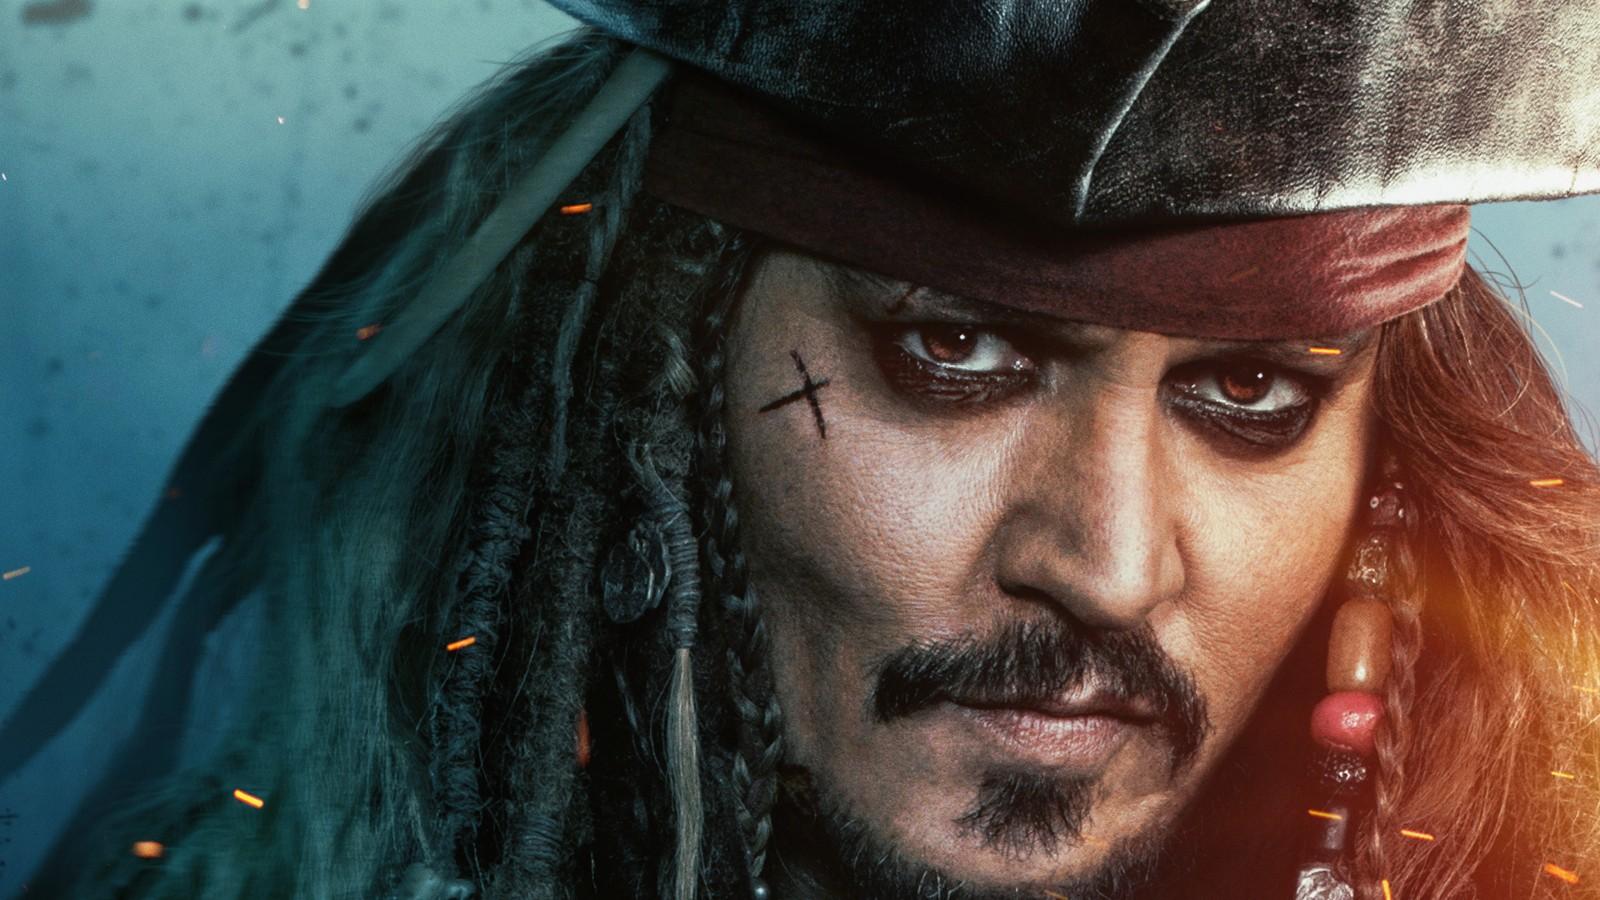 Wallpaper Hd Iphone Cute Men Pirates Of The Caribbean Dead Men Tell No Tales Jack